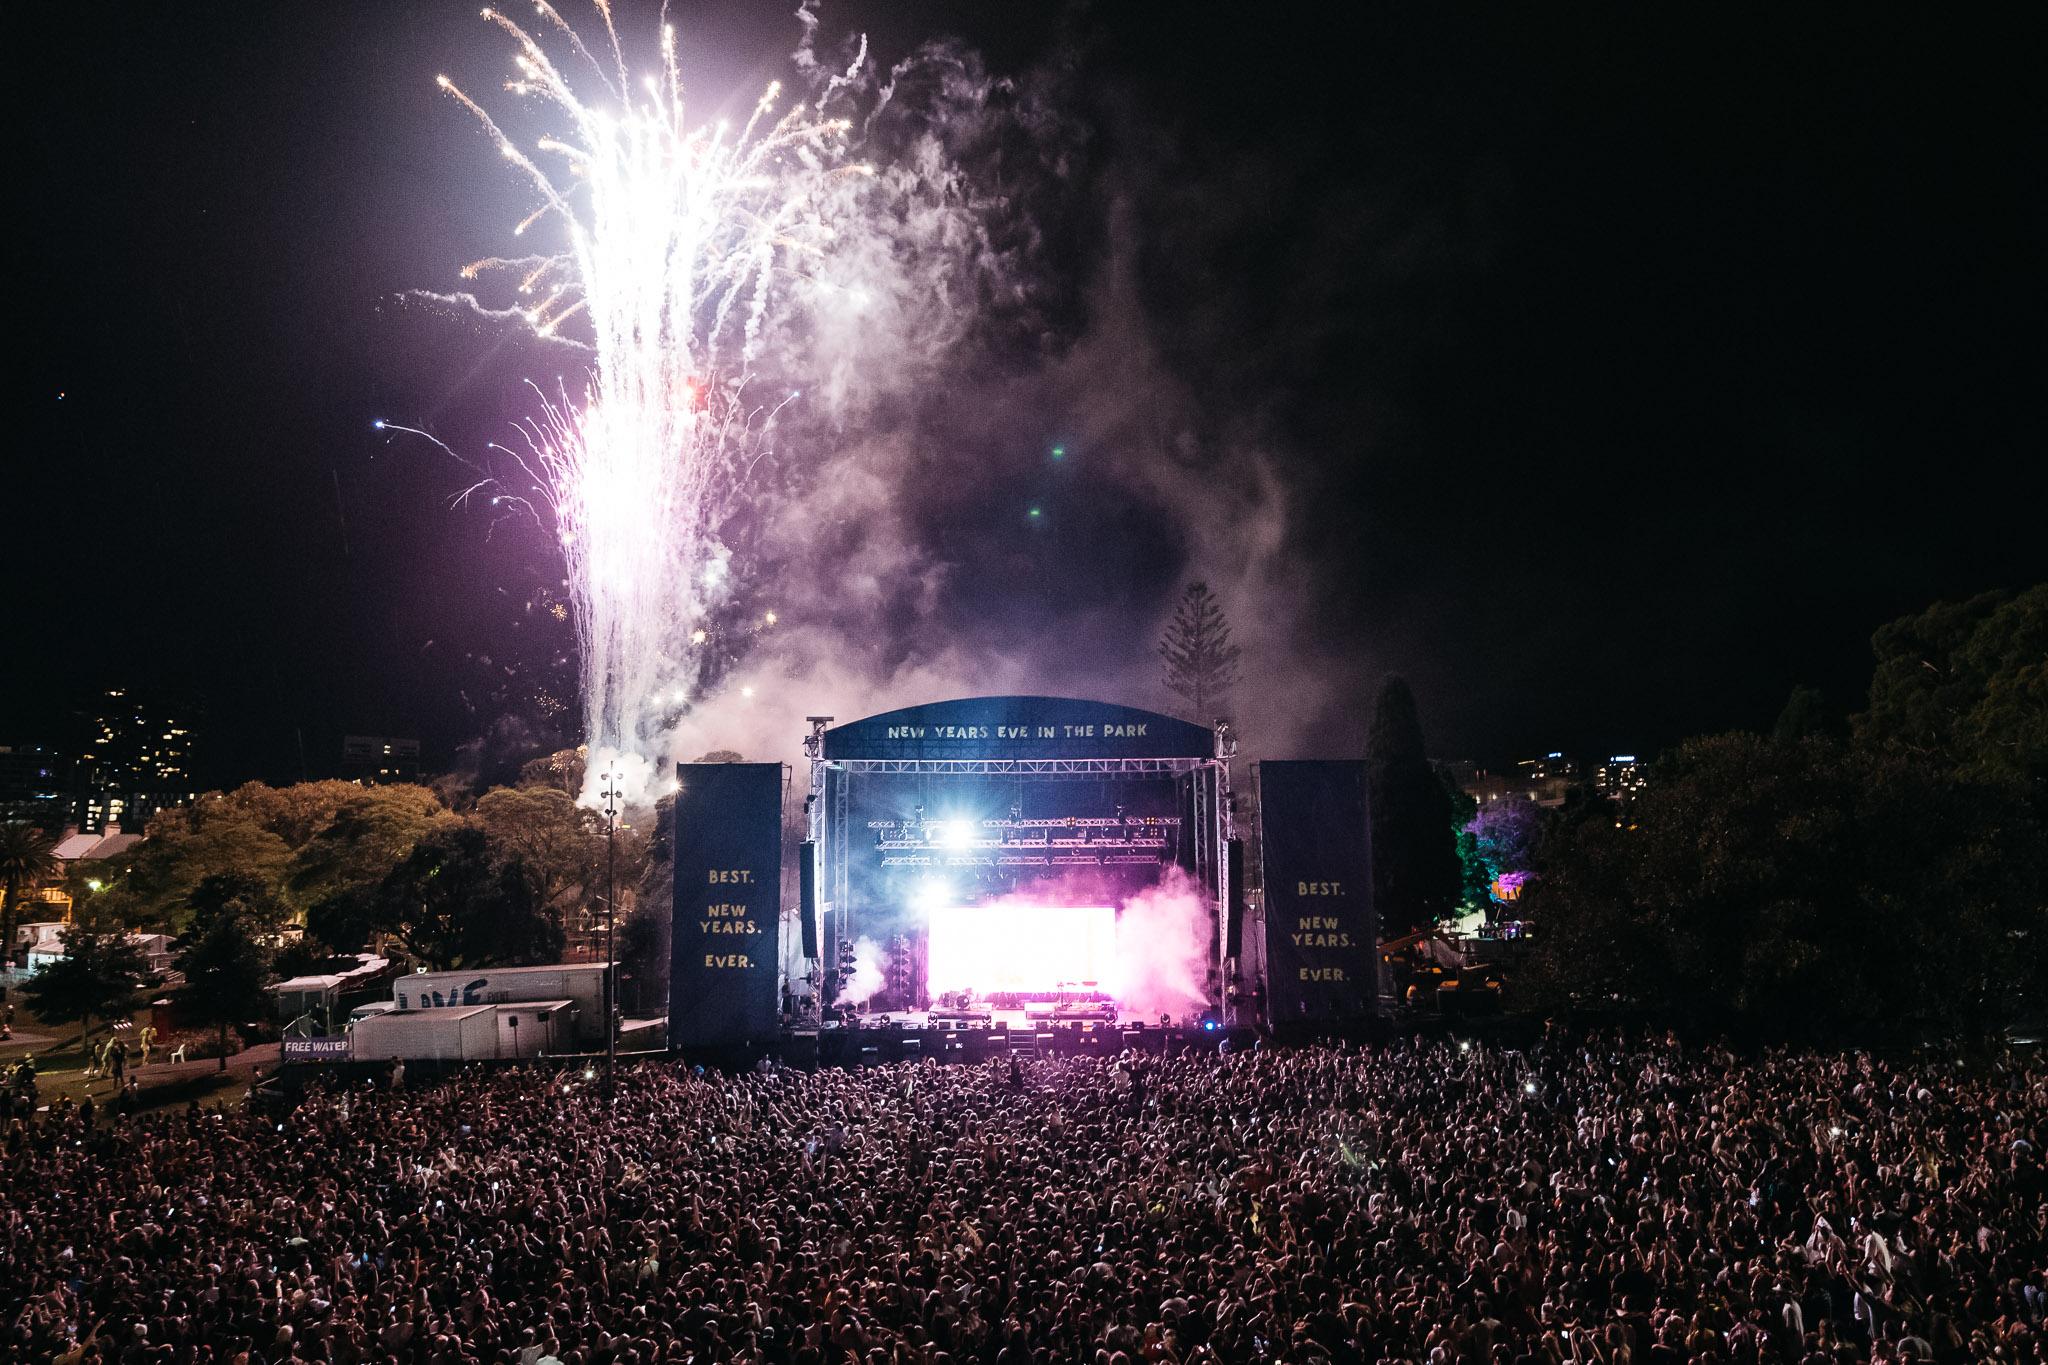 Sydney NYE - Music Festivals New Years Eve Australia 2019 - 2020